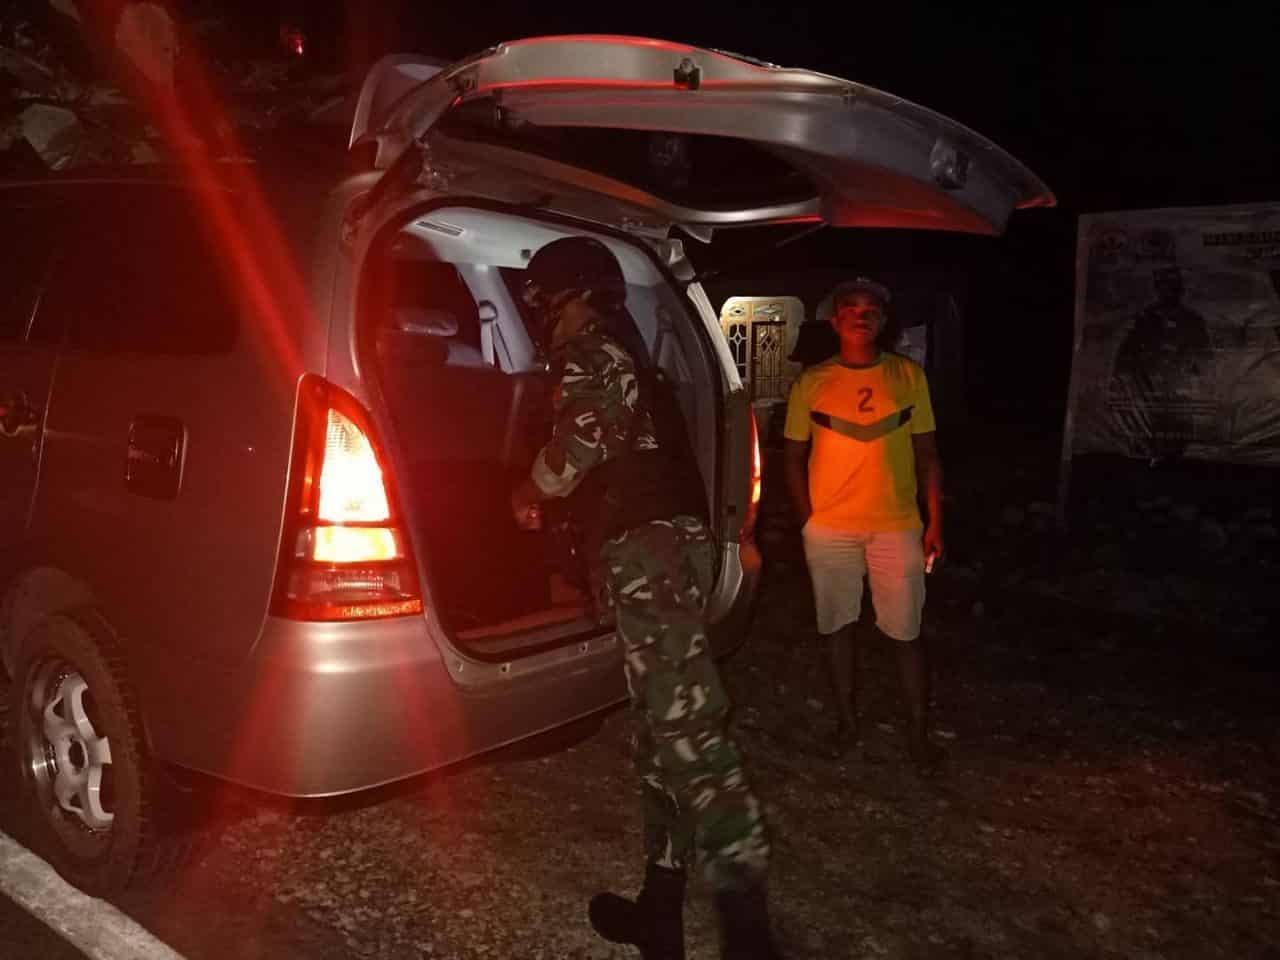 Jelang Tahun Baru, Satgas Yonif RK 744 Perketat Pemeriksaan di Perbatasan RI-RDTL